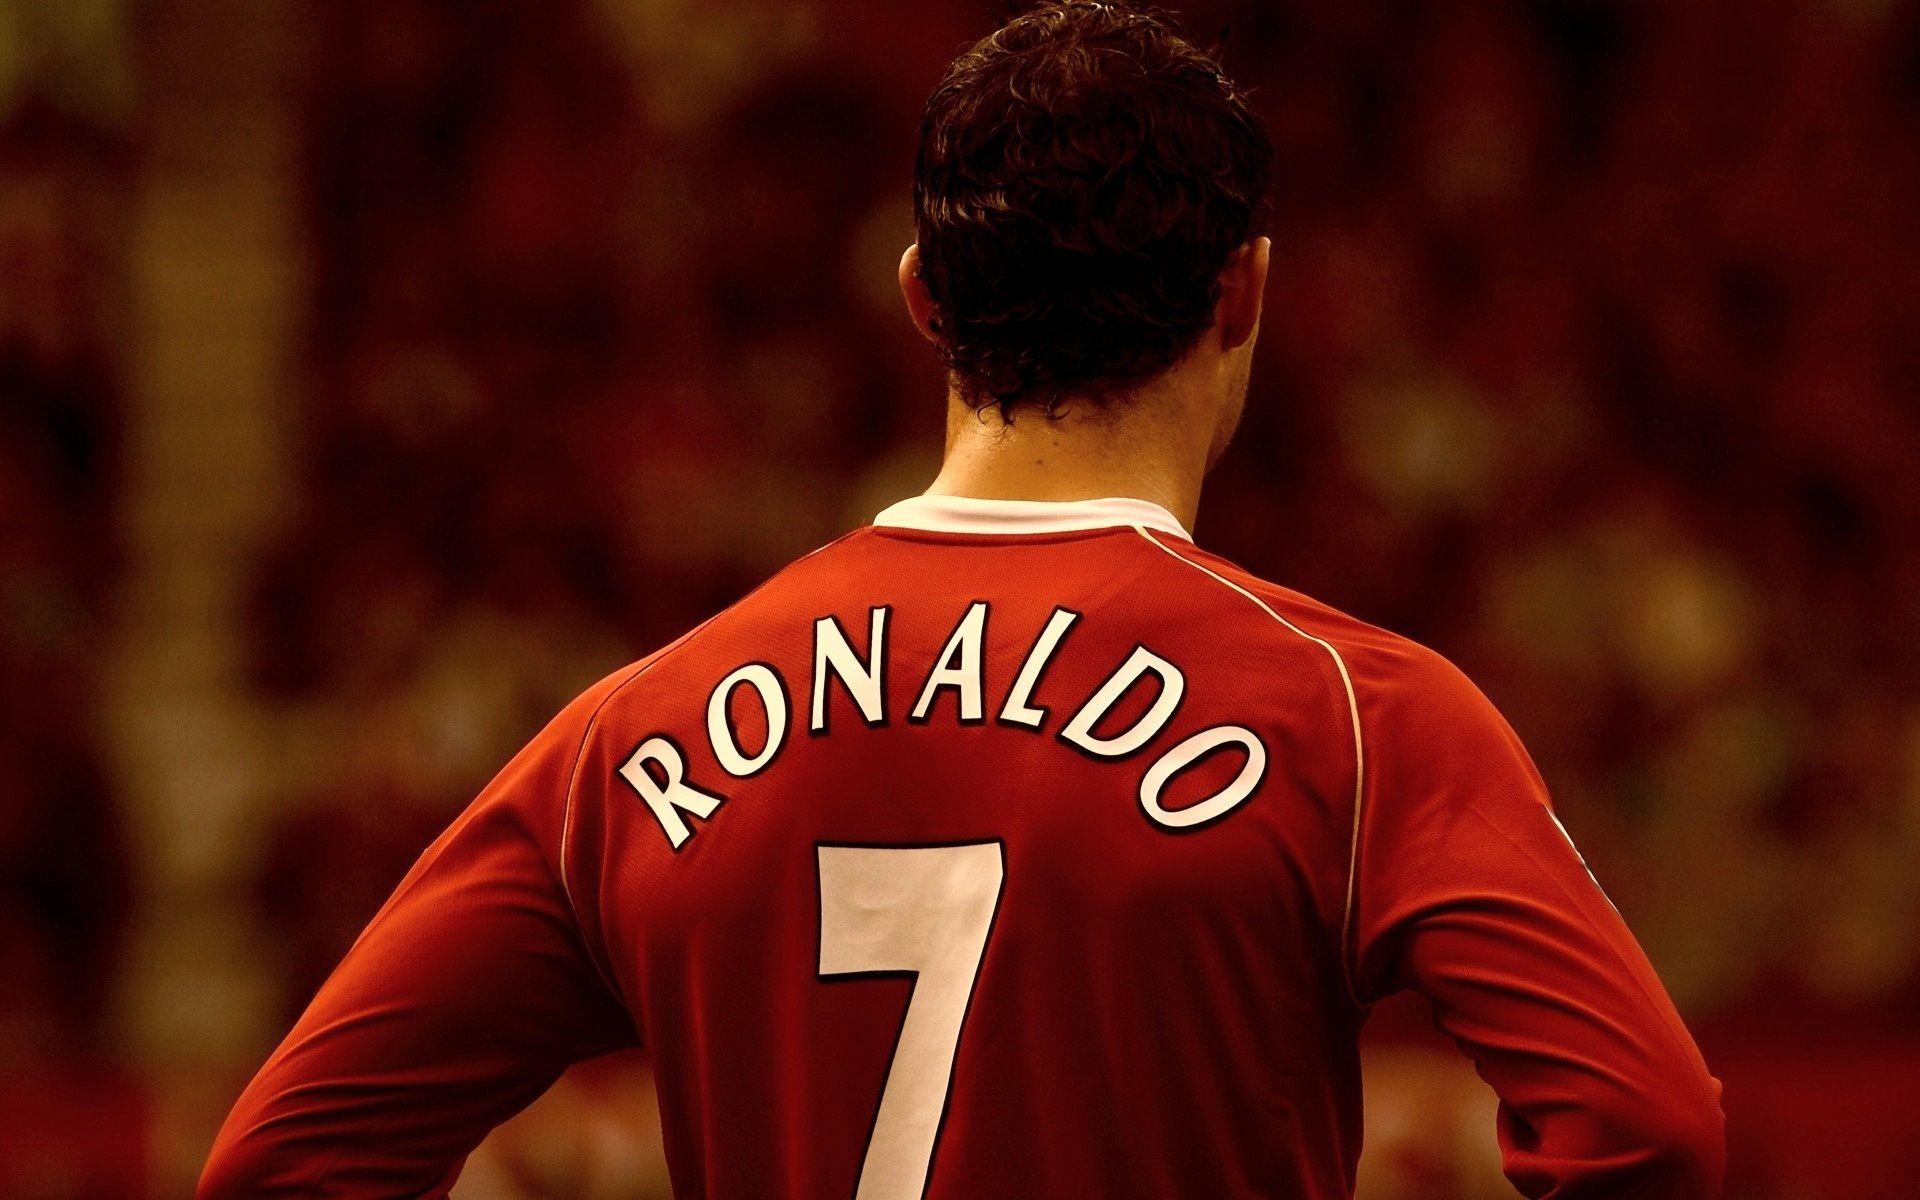 Download HD CRISTIANO RONALDO Football Player Wallpapers